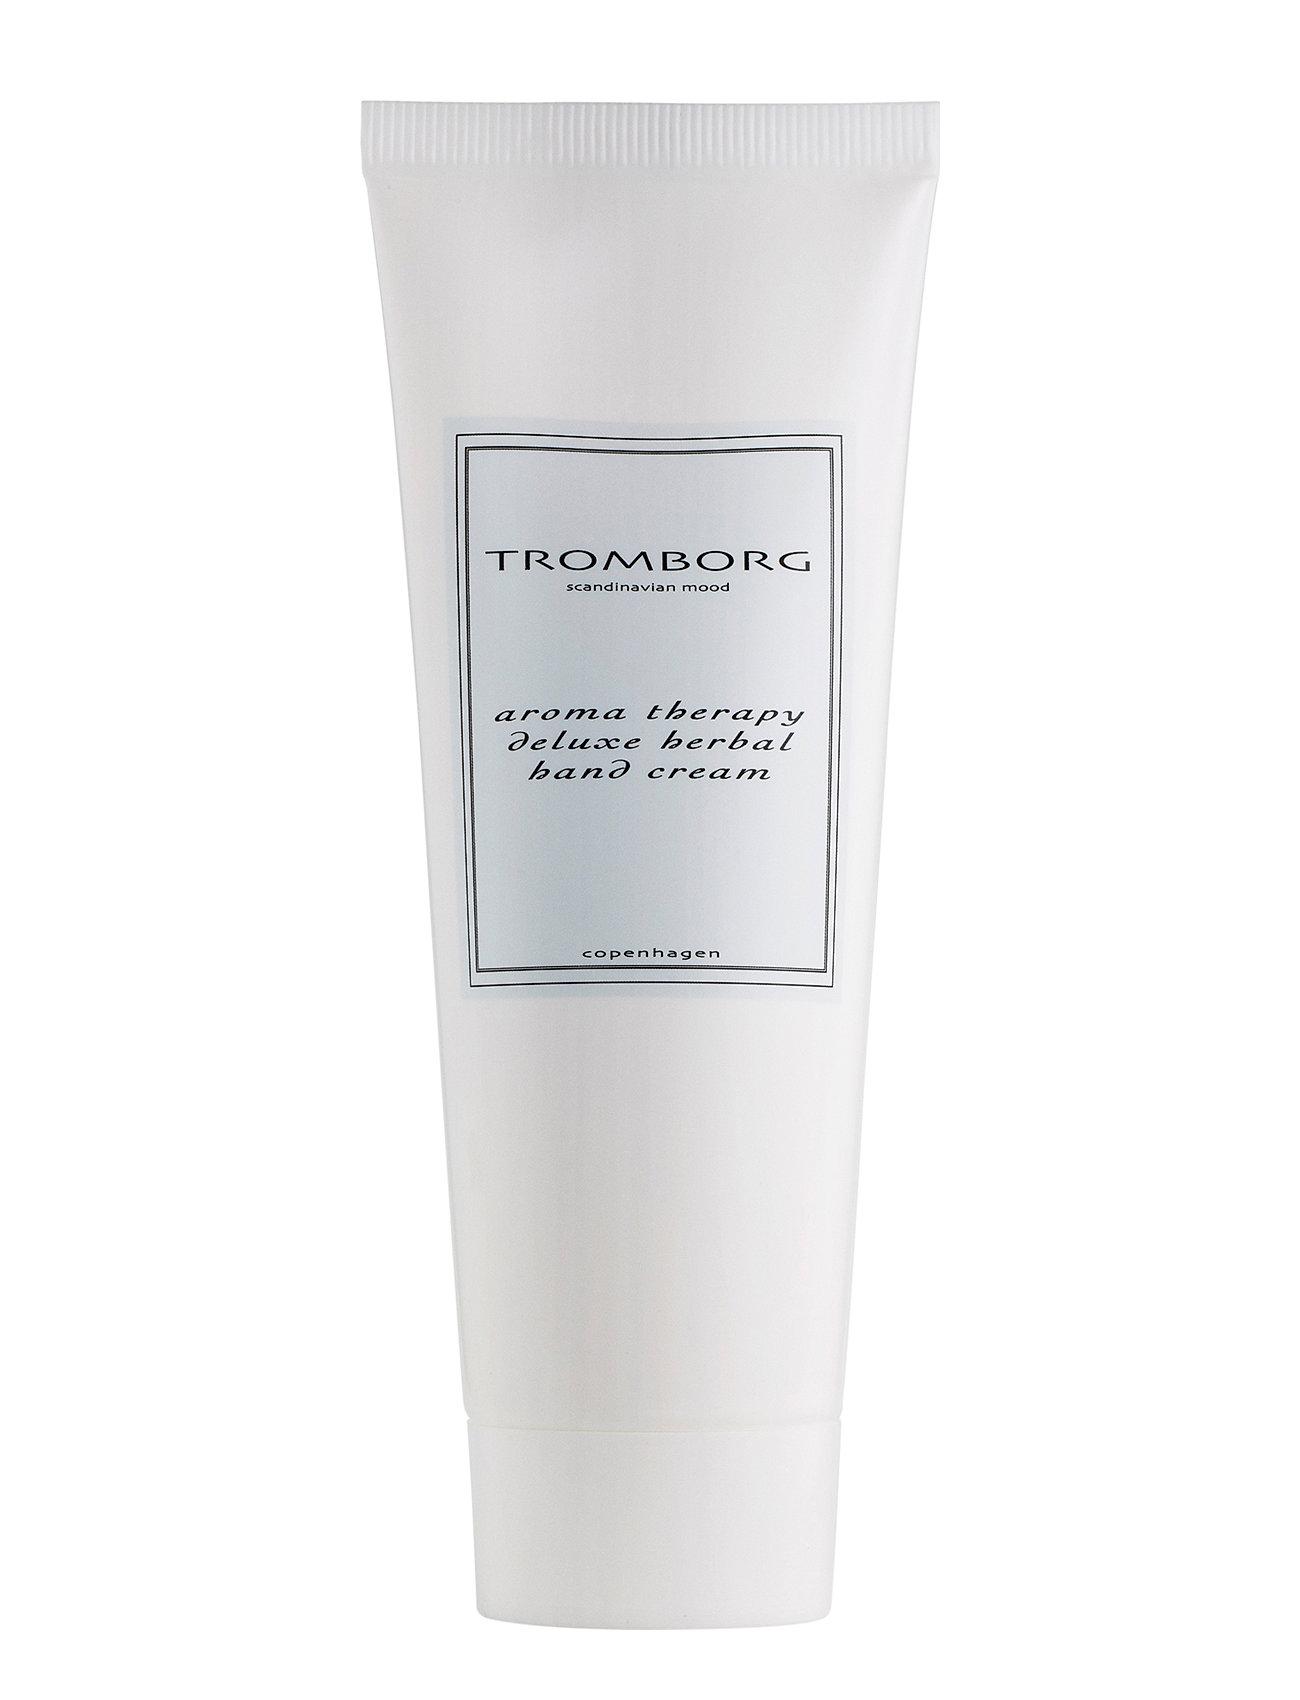 Image of Aroma Therapy Deluxe Herbal Hand Cream Beauty WOMEN Skin Care Body Hand Cream & Foot Cream Nude Tromborg (3270672903)